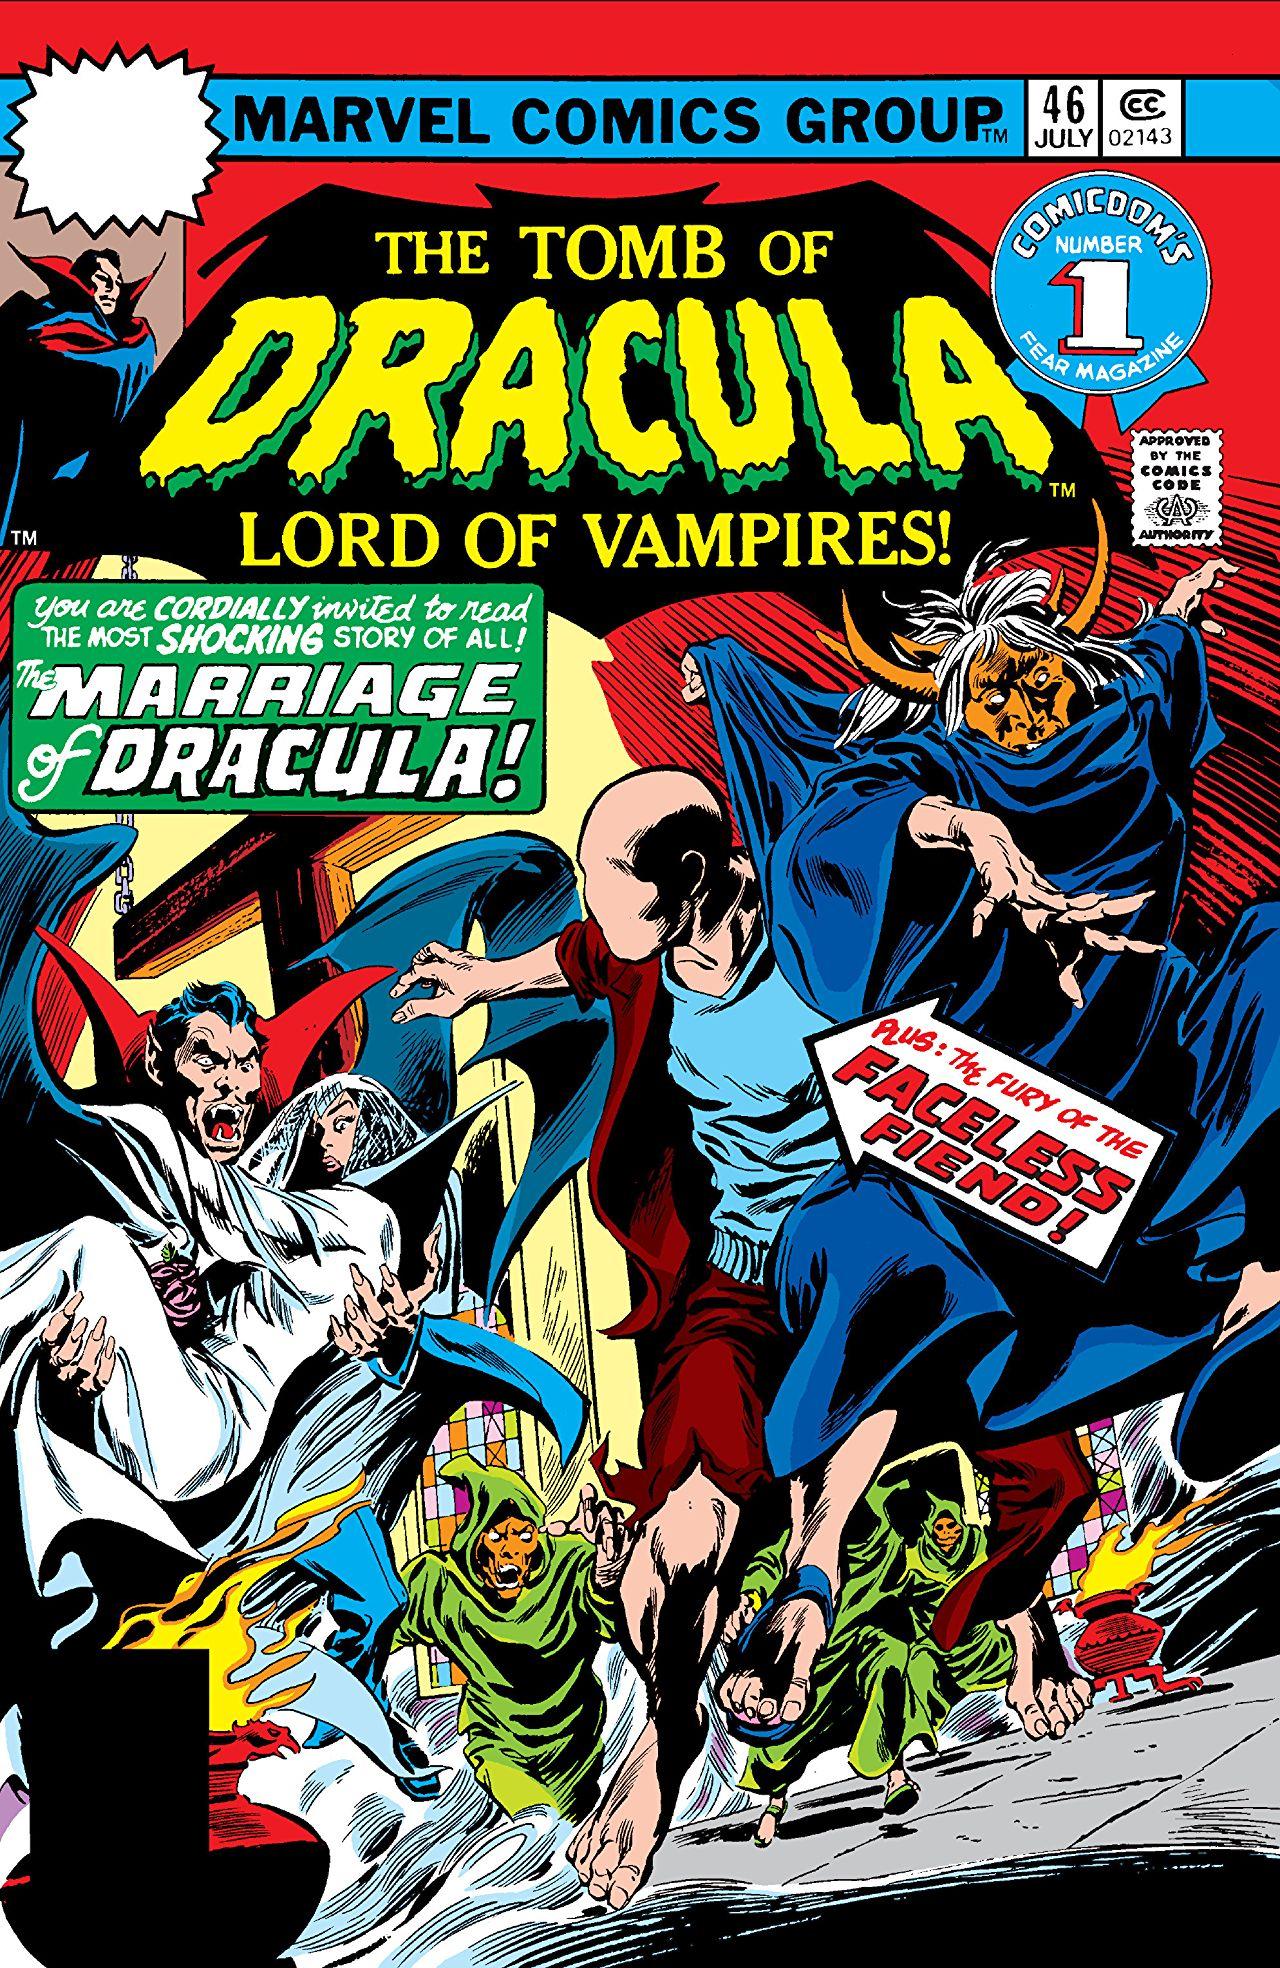 Tomb of Dracula 46